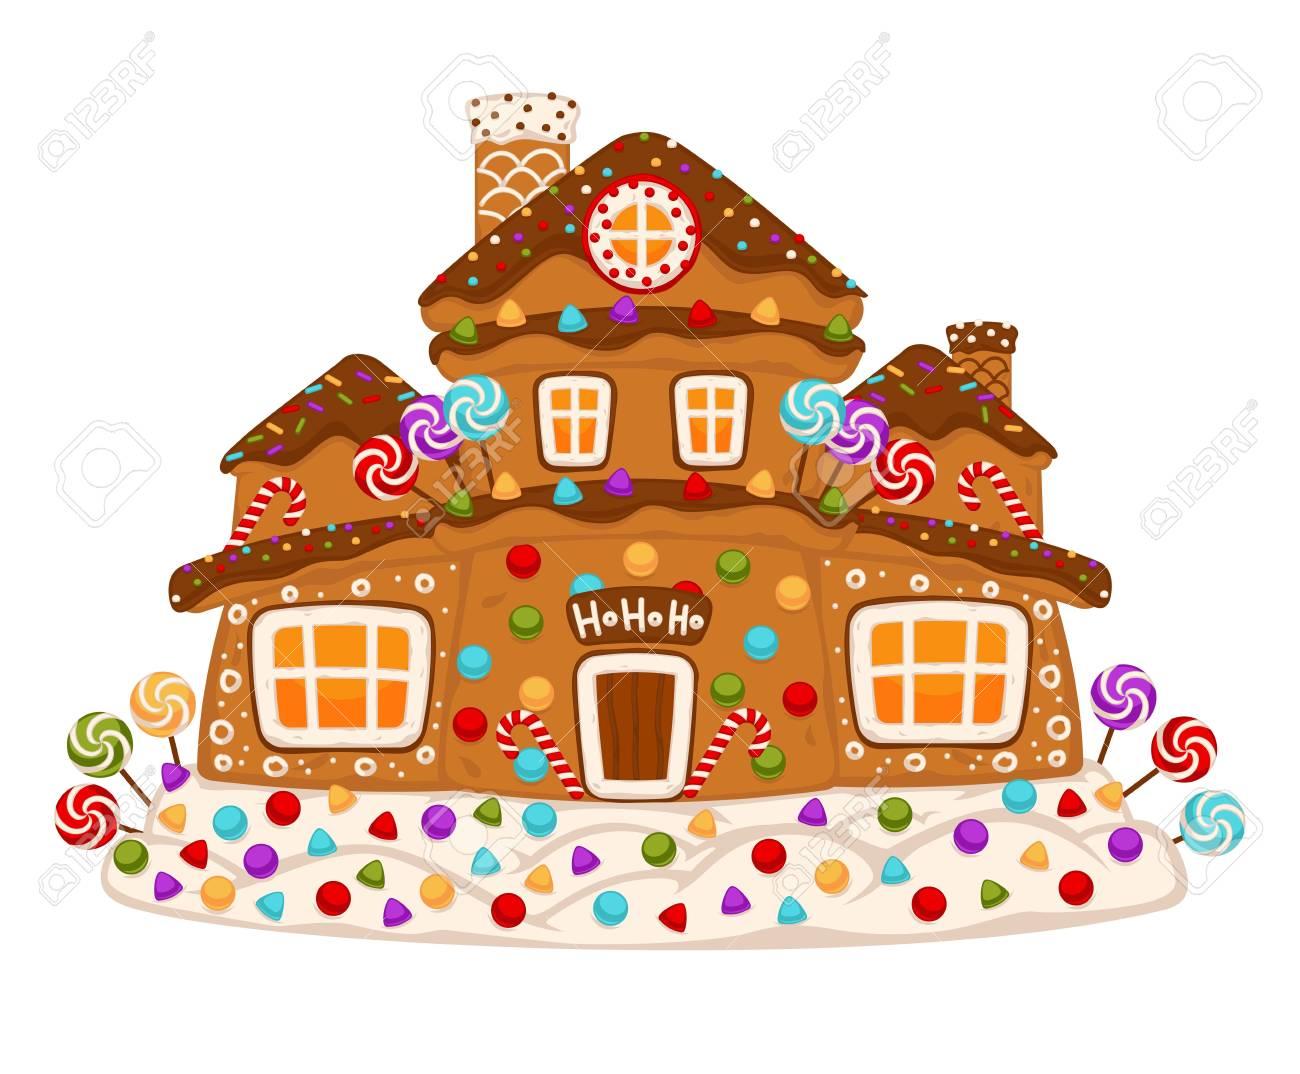 Christmas Gingerbread House Cartoon.Christmas Gingerbread Cookie House Vector Isolated Cartoon Ginger